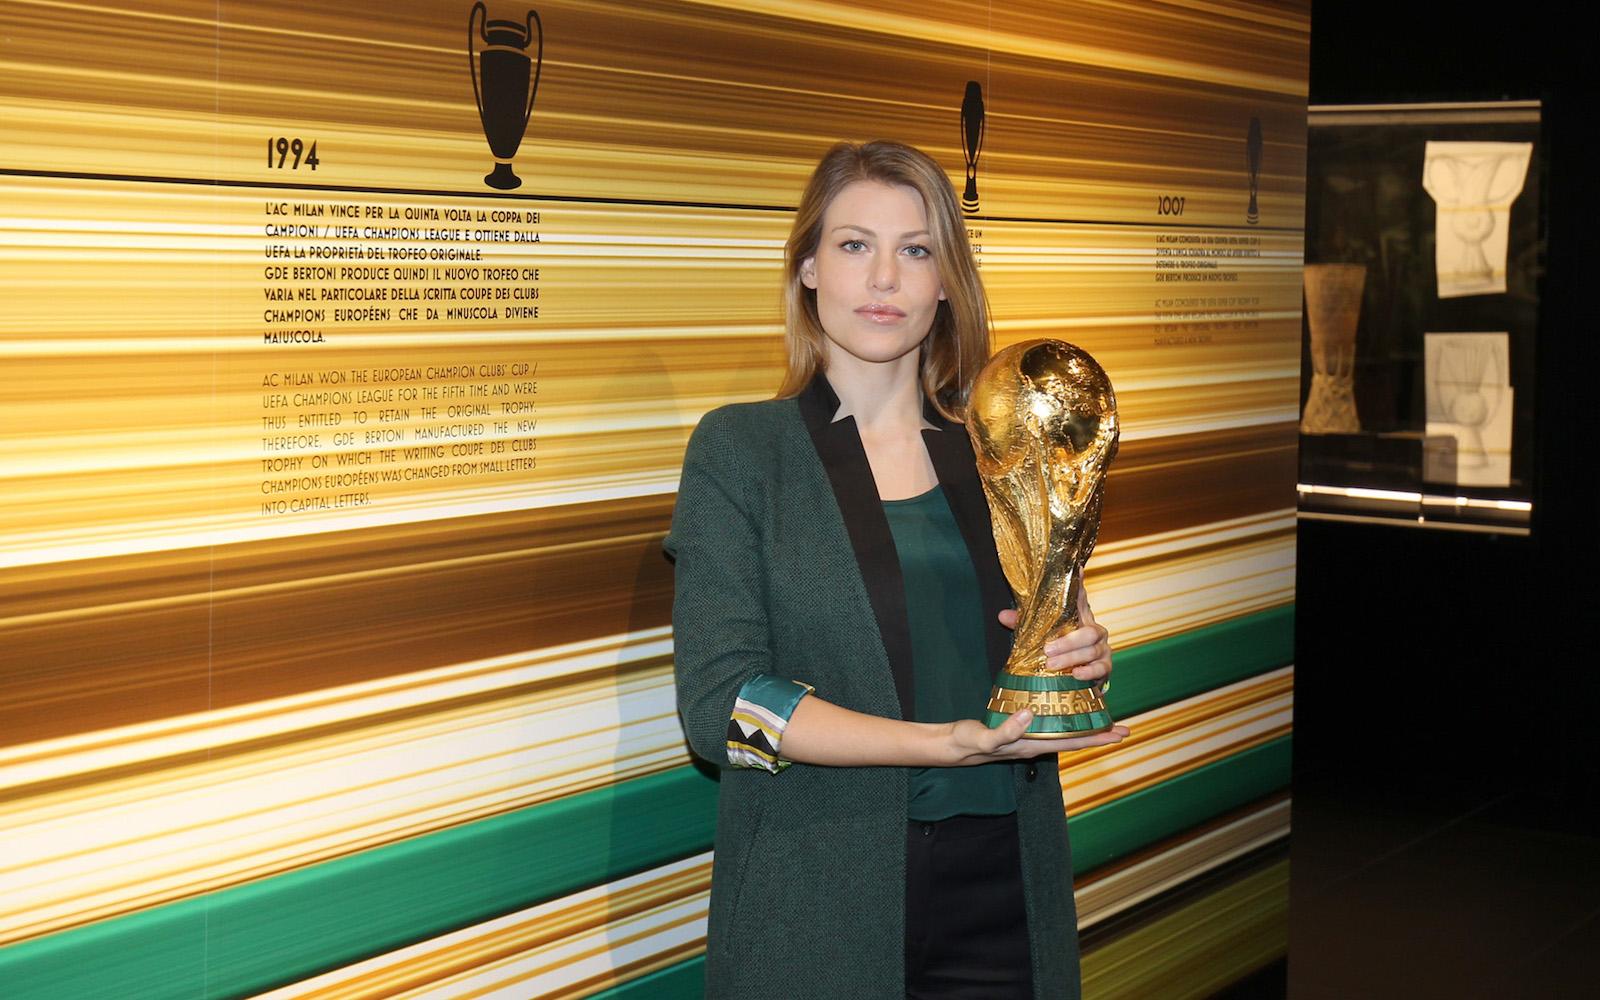 Barbara Berlusconi al Museo Mondo Milan con la Coppa del Mondo. Fonte foto: A.C. Milan